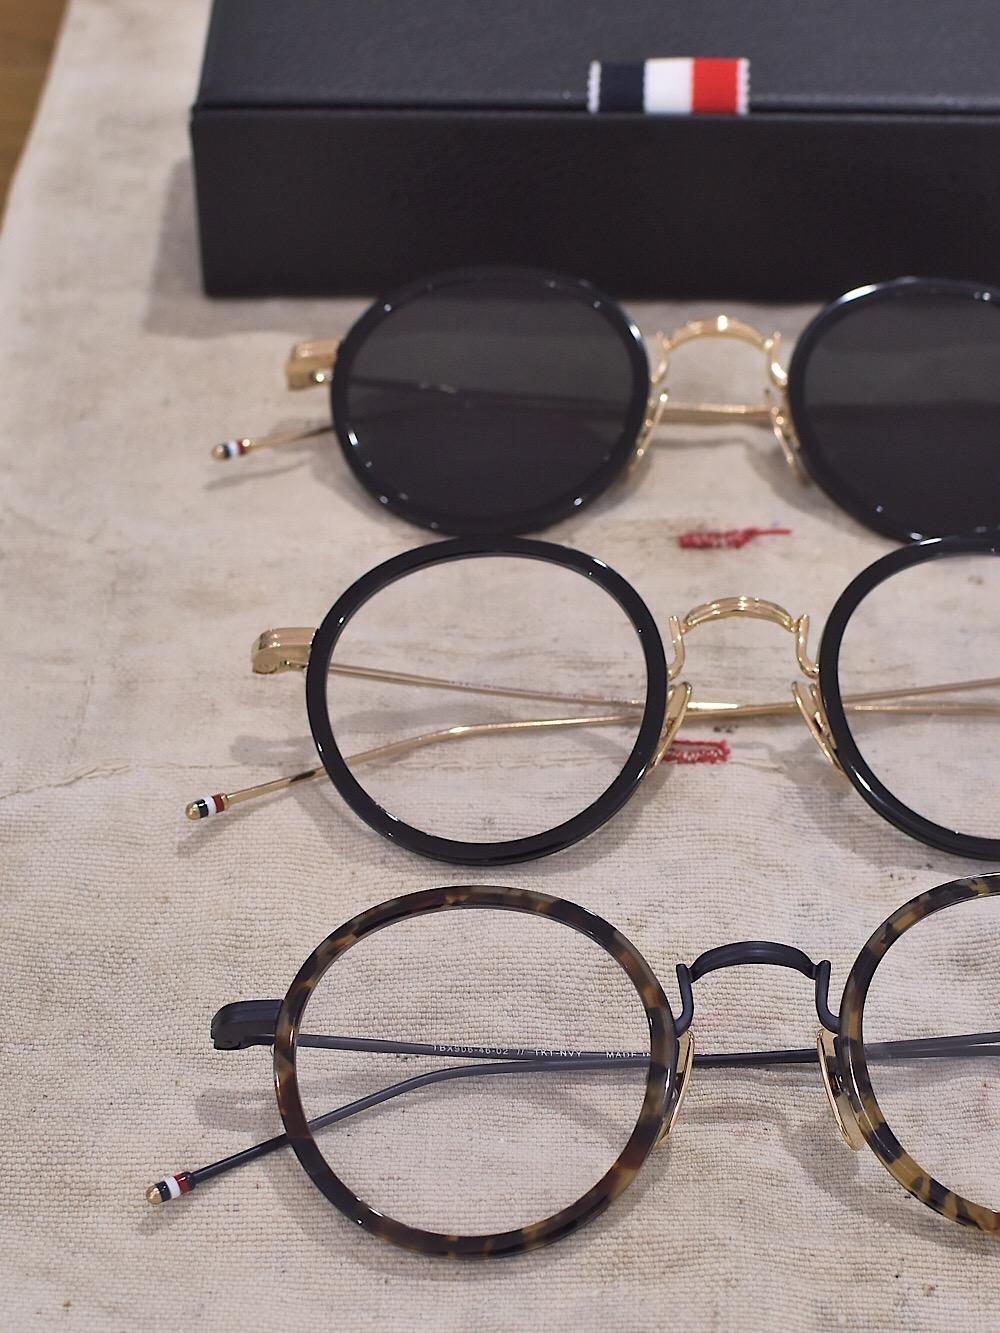 THOM BROWNE. トムブラウン TB-906 コンビネーション ラウンドシェイプ 福岡の眼鏡店 北九州 メガネ男子 眼鏡女子